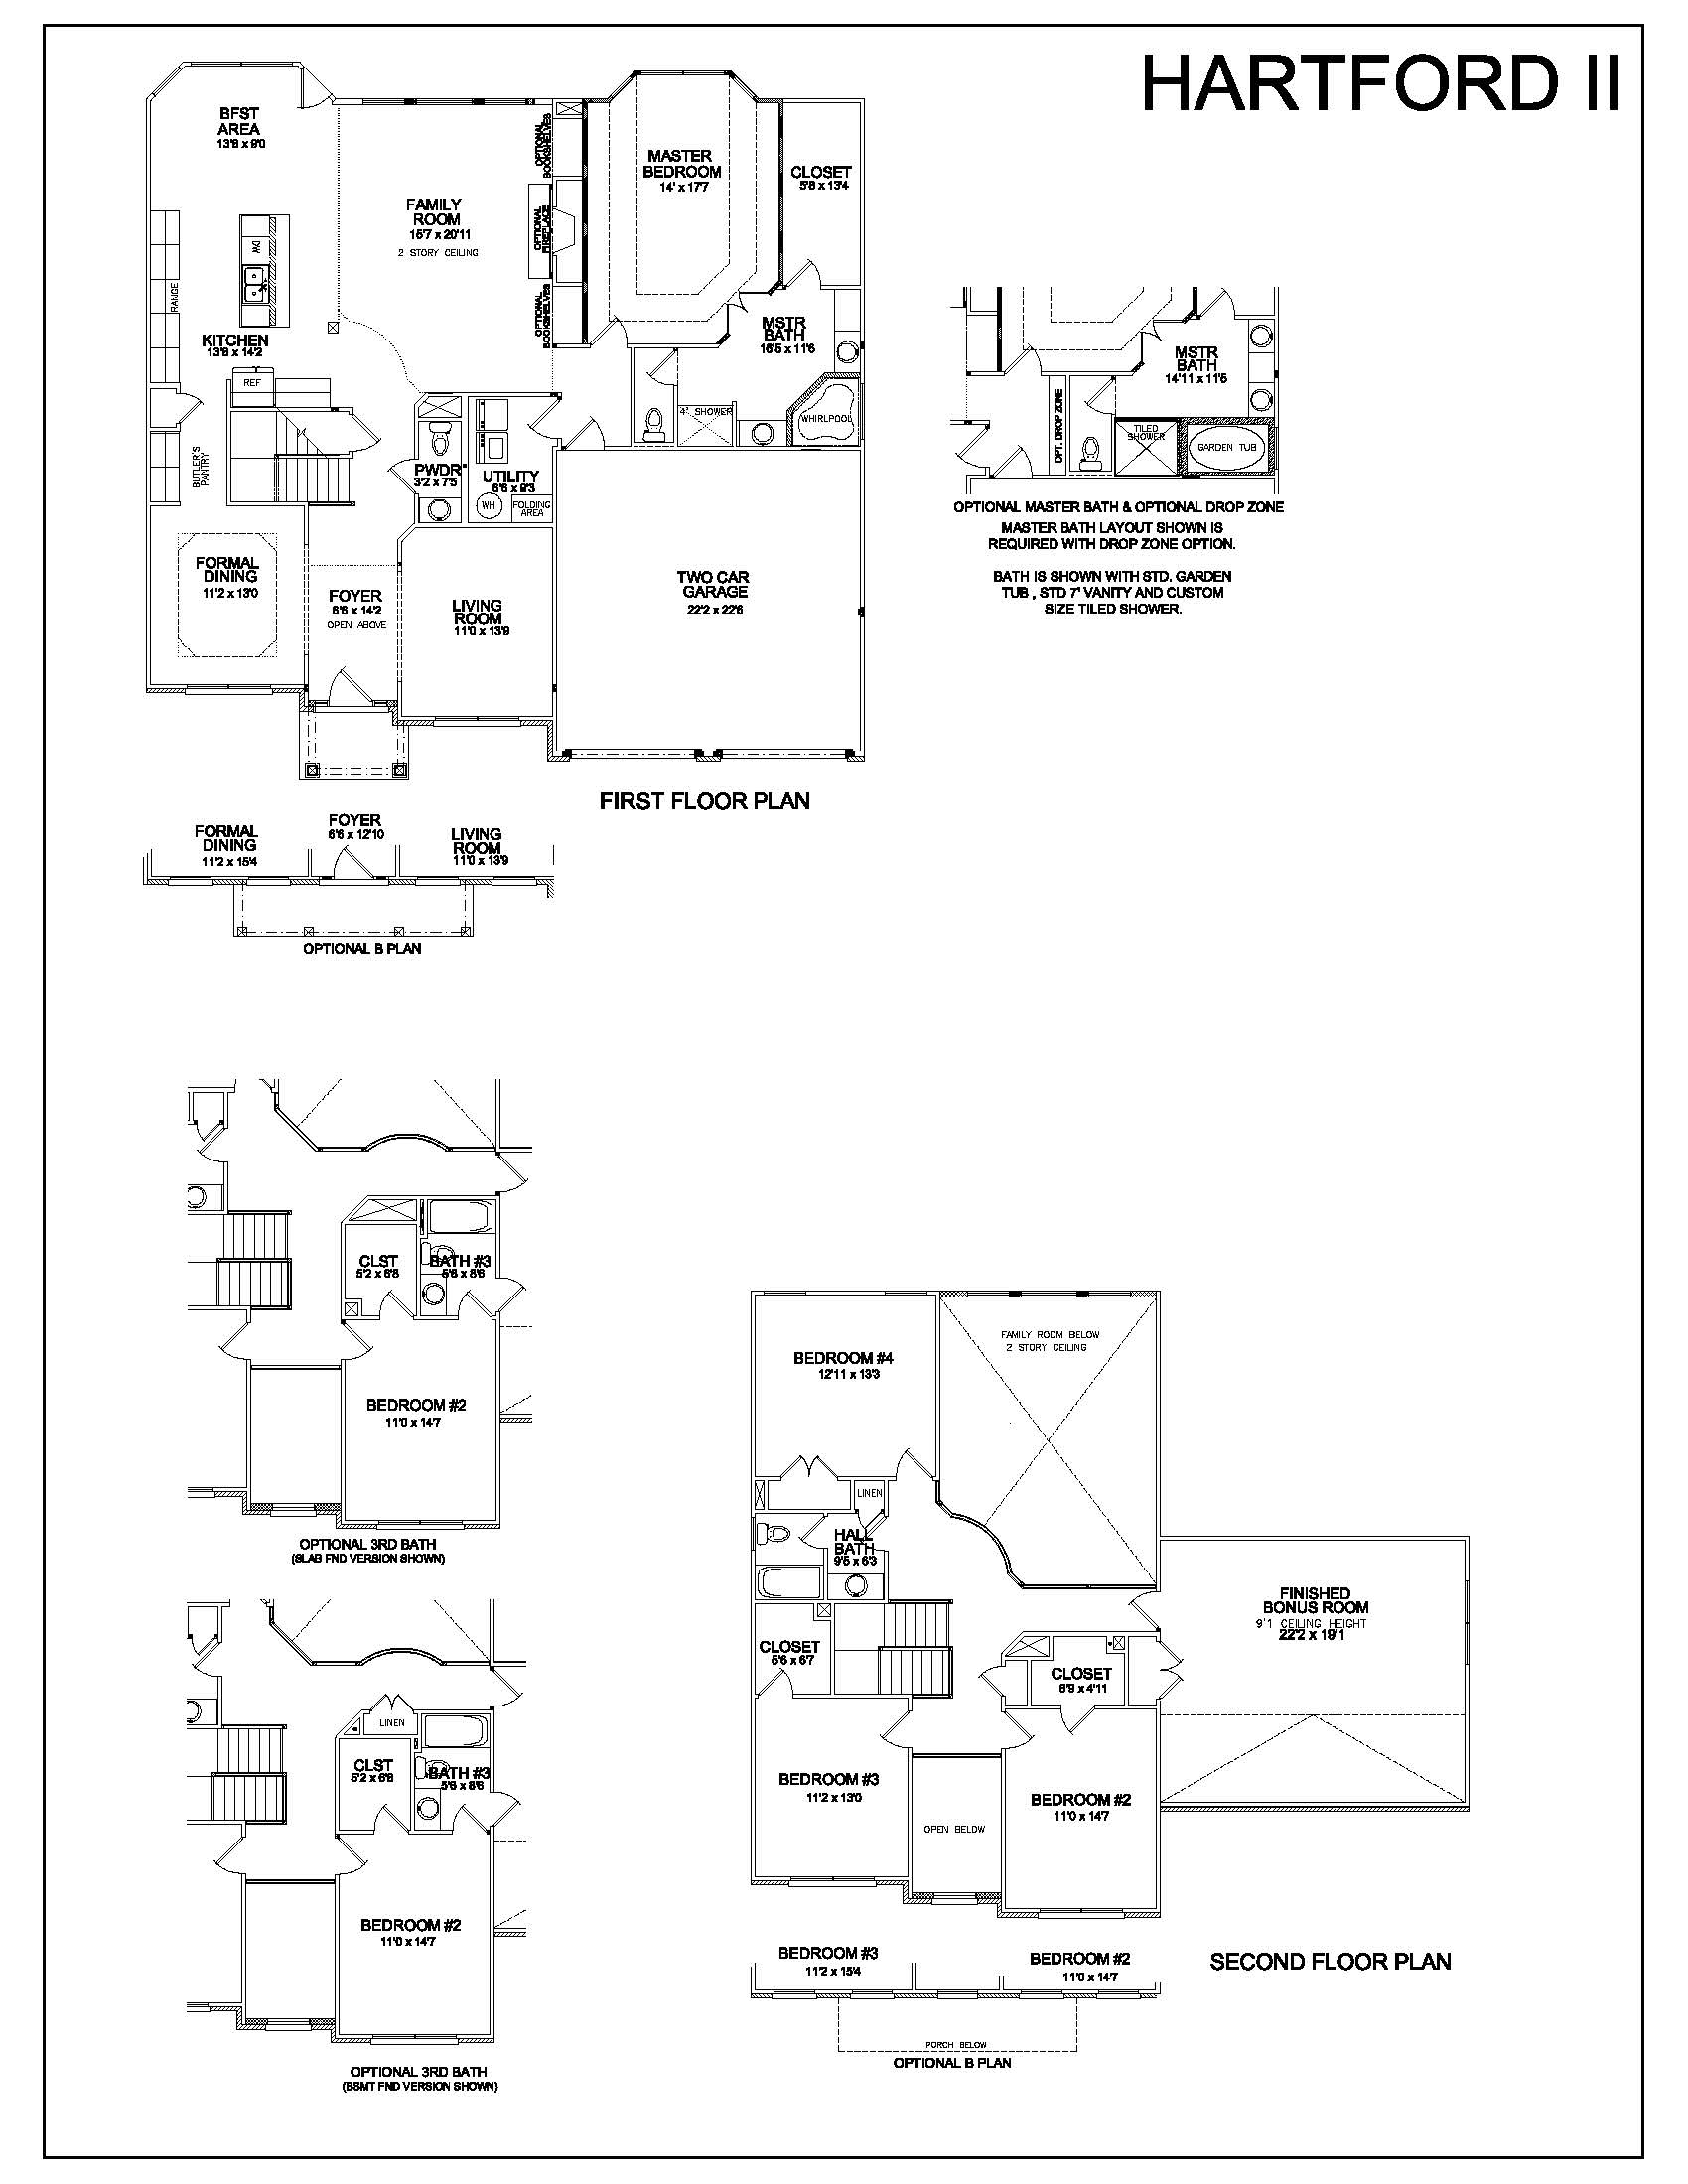 floor plans hartford ii louisville real estate